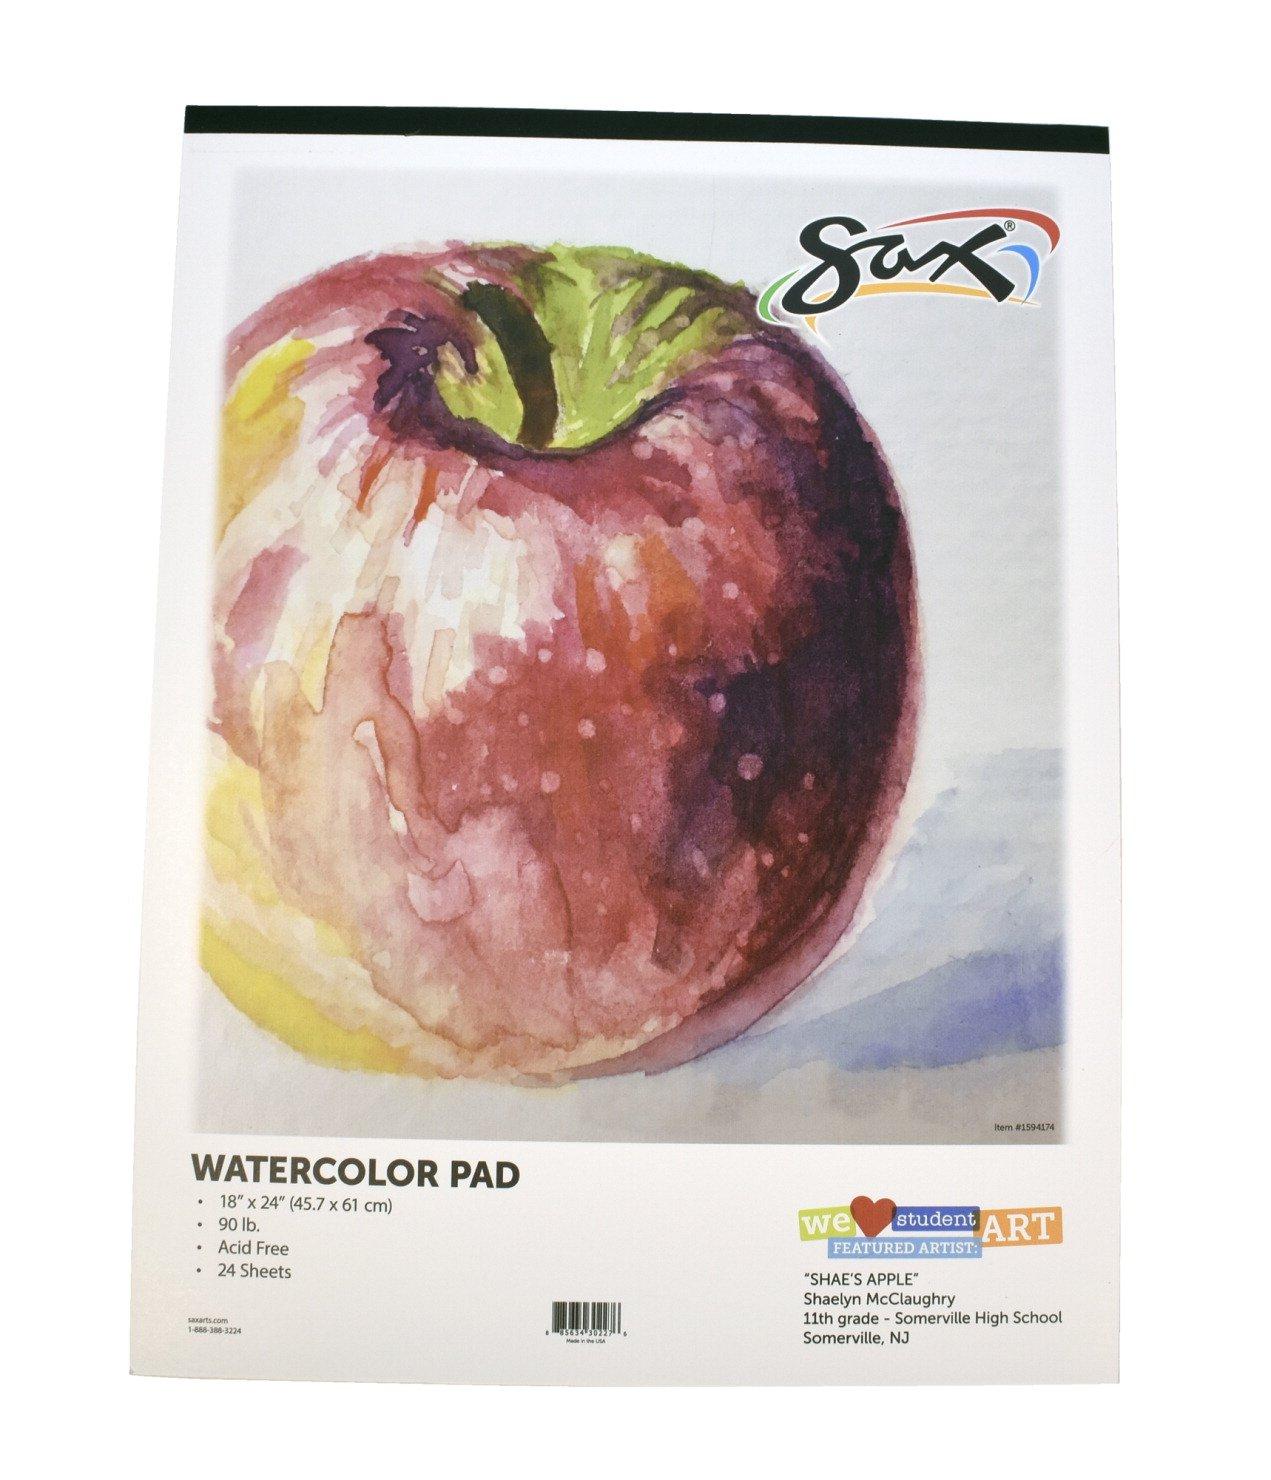 White 18 x 24 Inches 24 Sheets 90 lb Sax Watercolor Pad